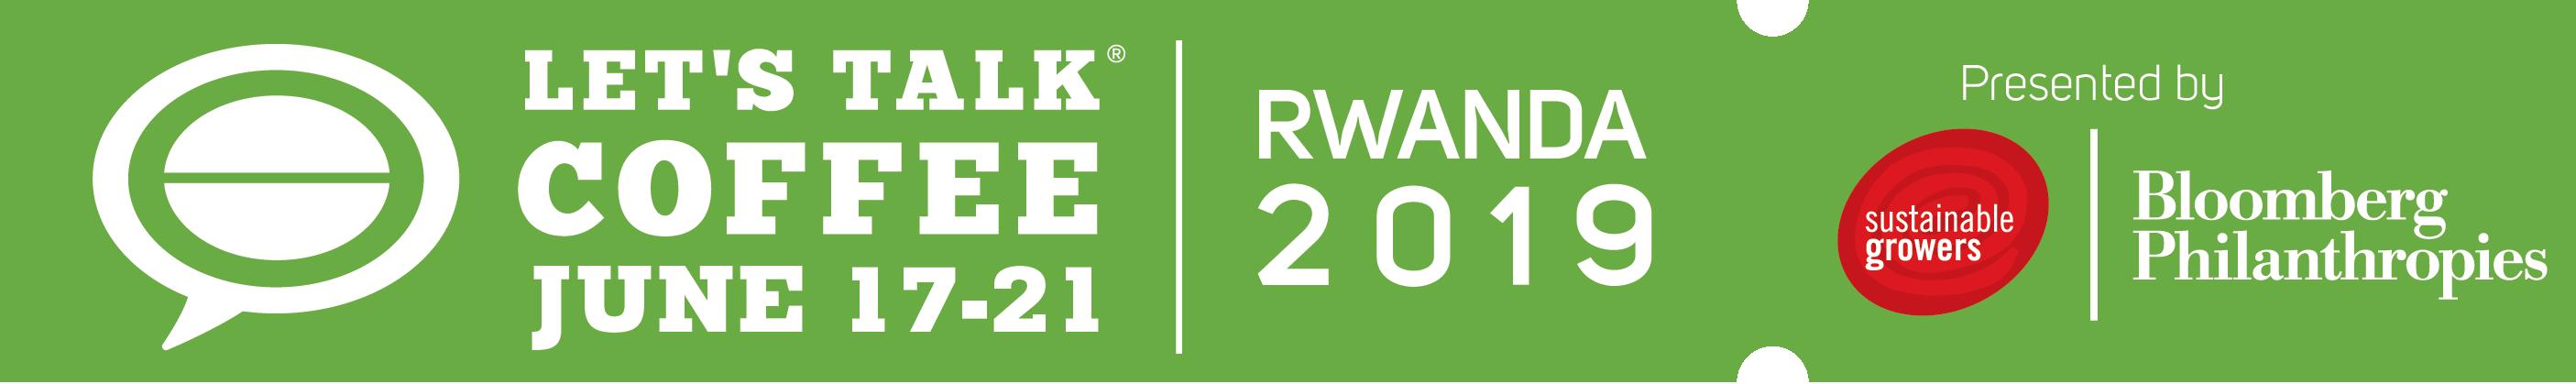 Let's Talk Coffee Rwanda 2019